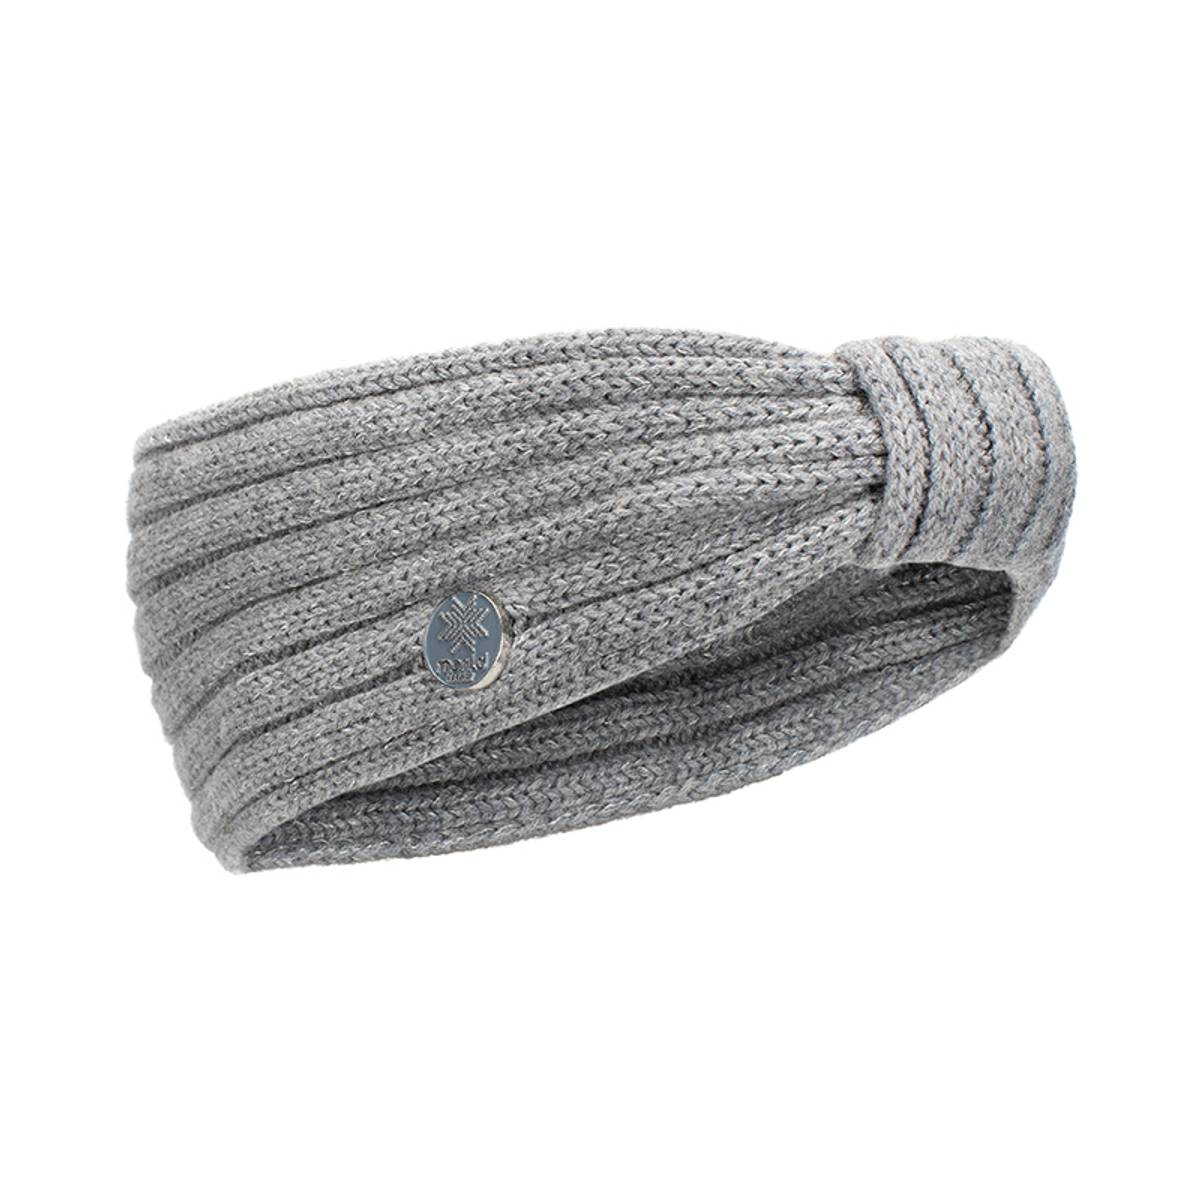 Morild Vale pannebånd med refleks, grå